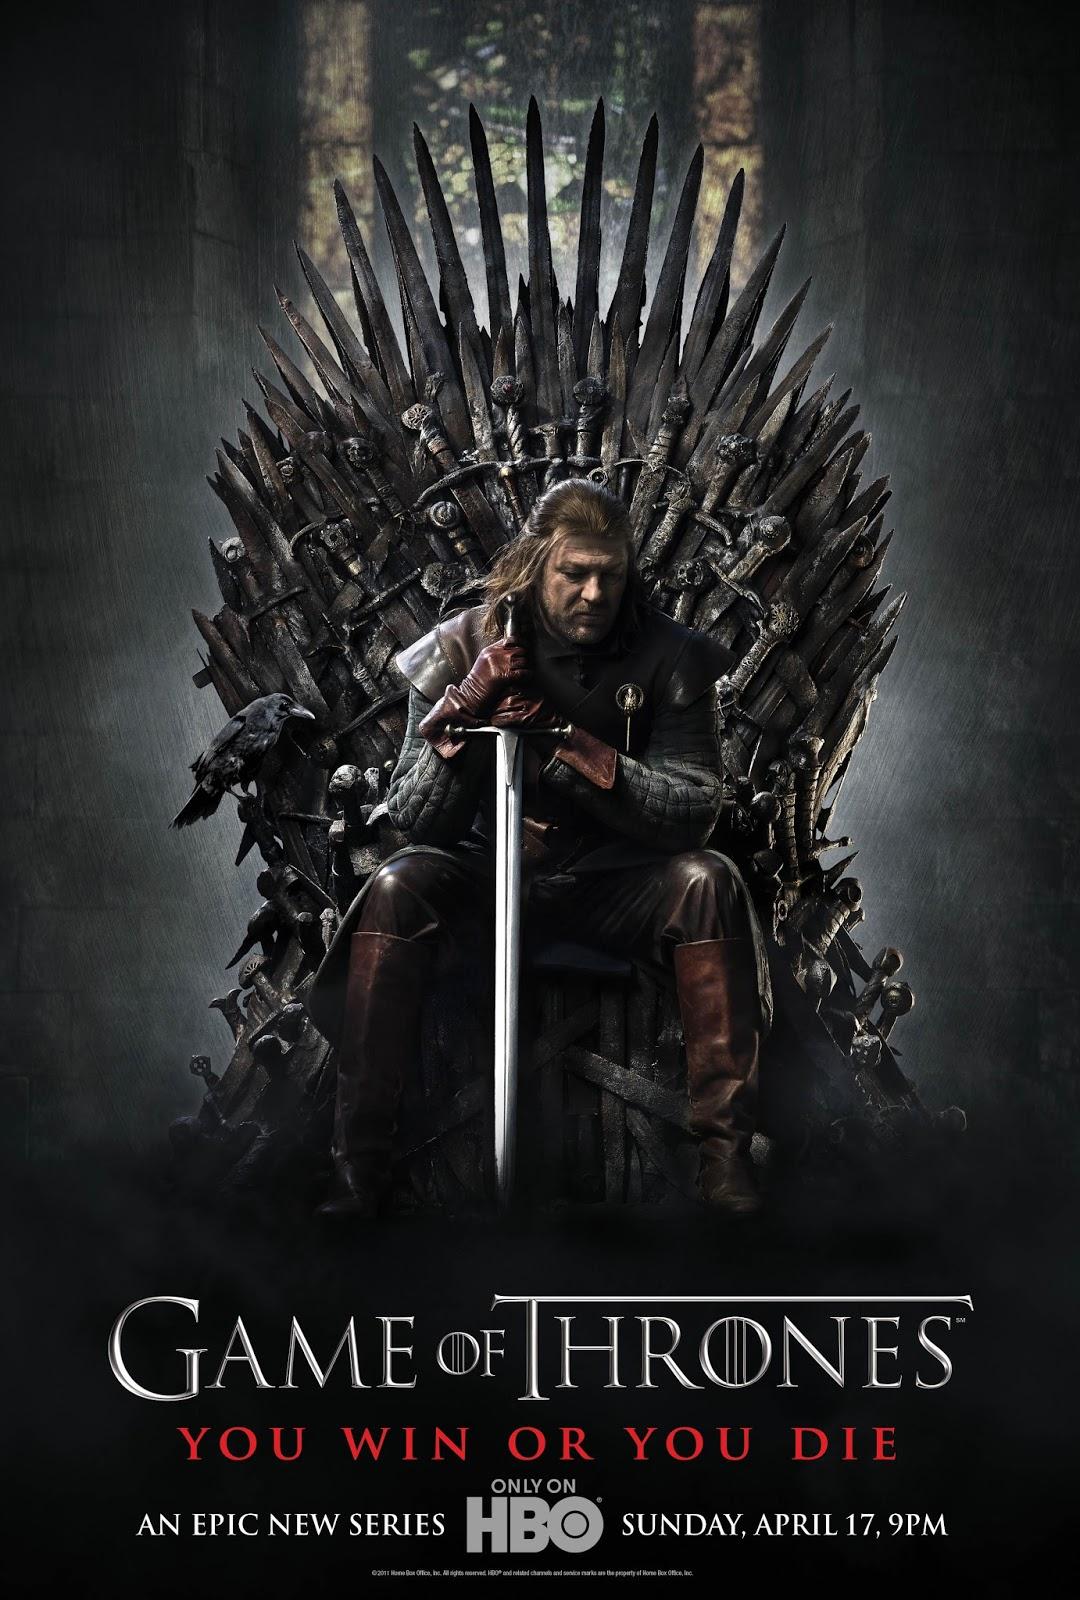 Game of Thrones SS01 ตอนที่ 1-10 ซับไทย/พากย์ไทย [จบ] HD